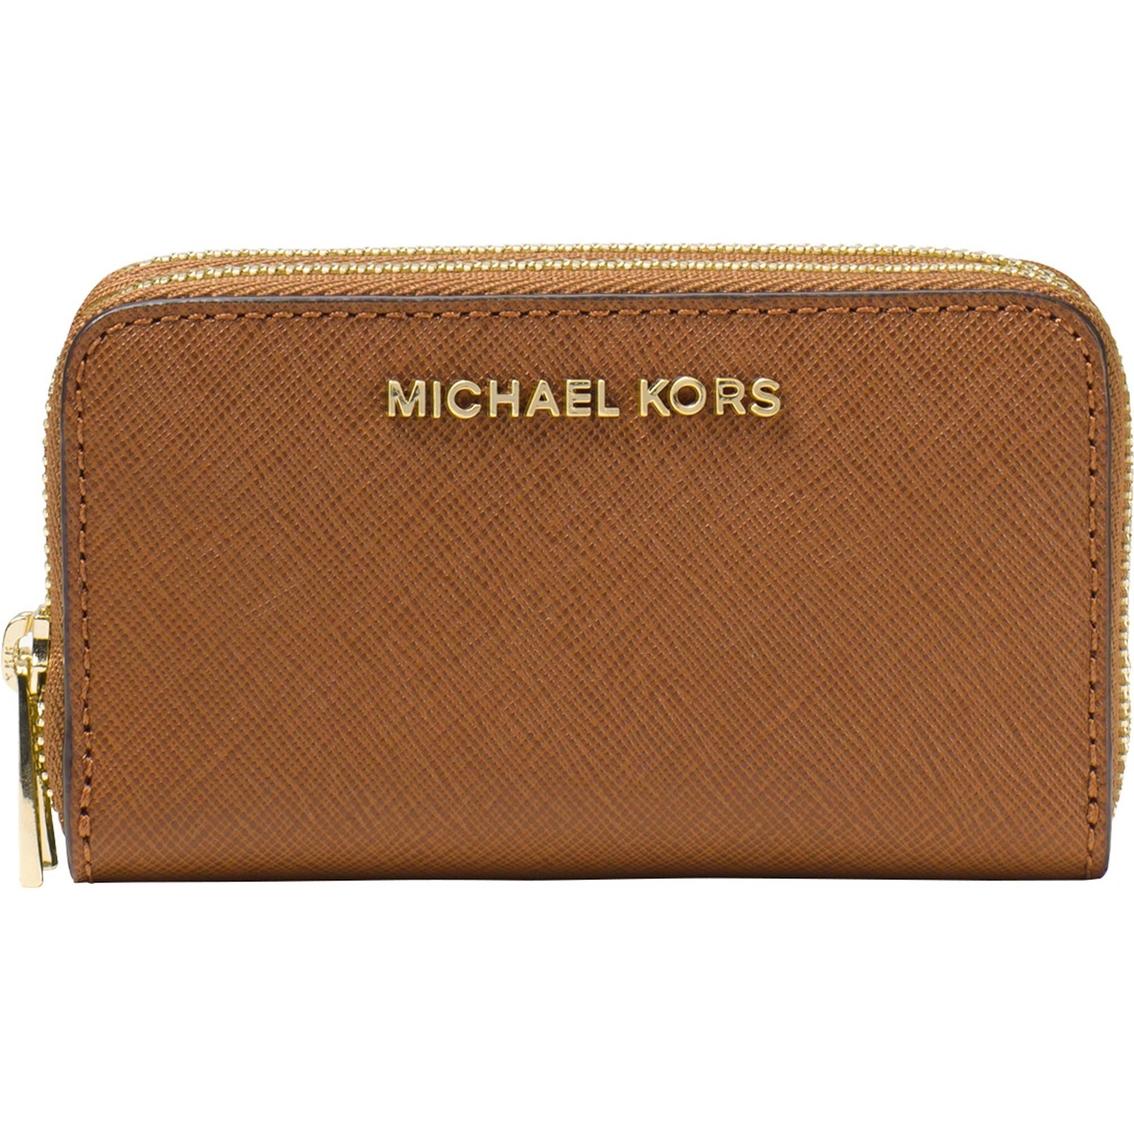 67bf198a3279 Michael Kors Jet Set Travel Double Zip Around Card Holder